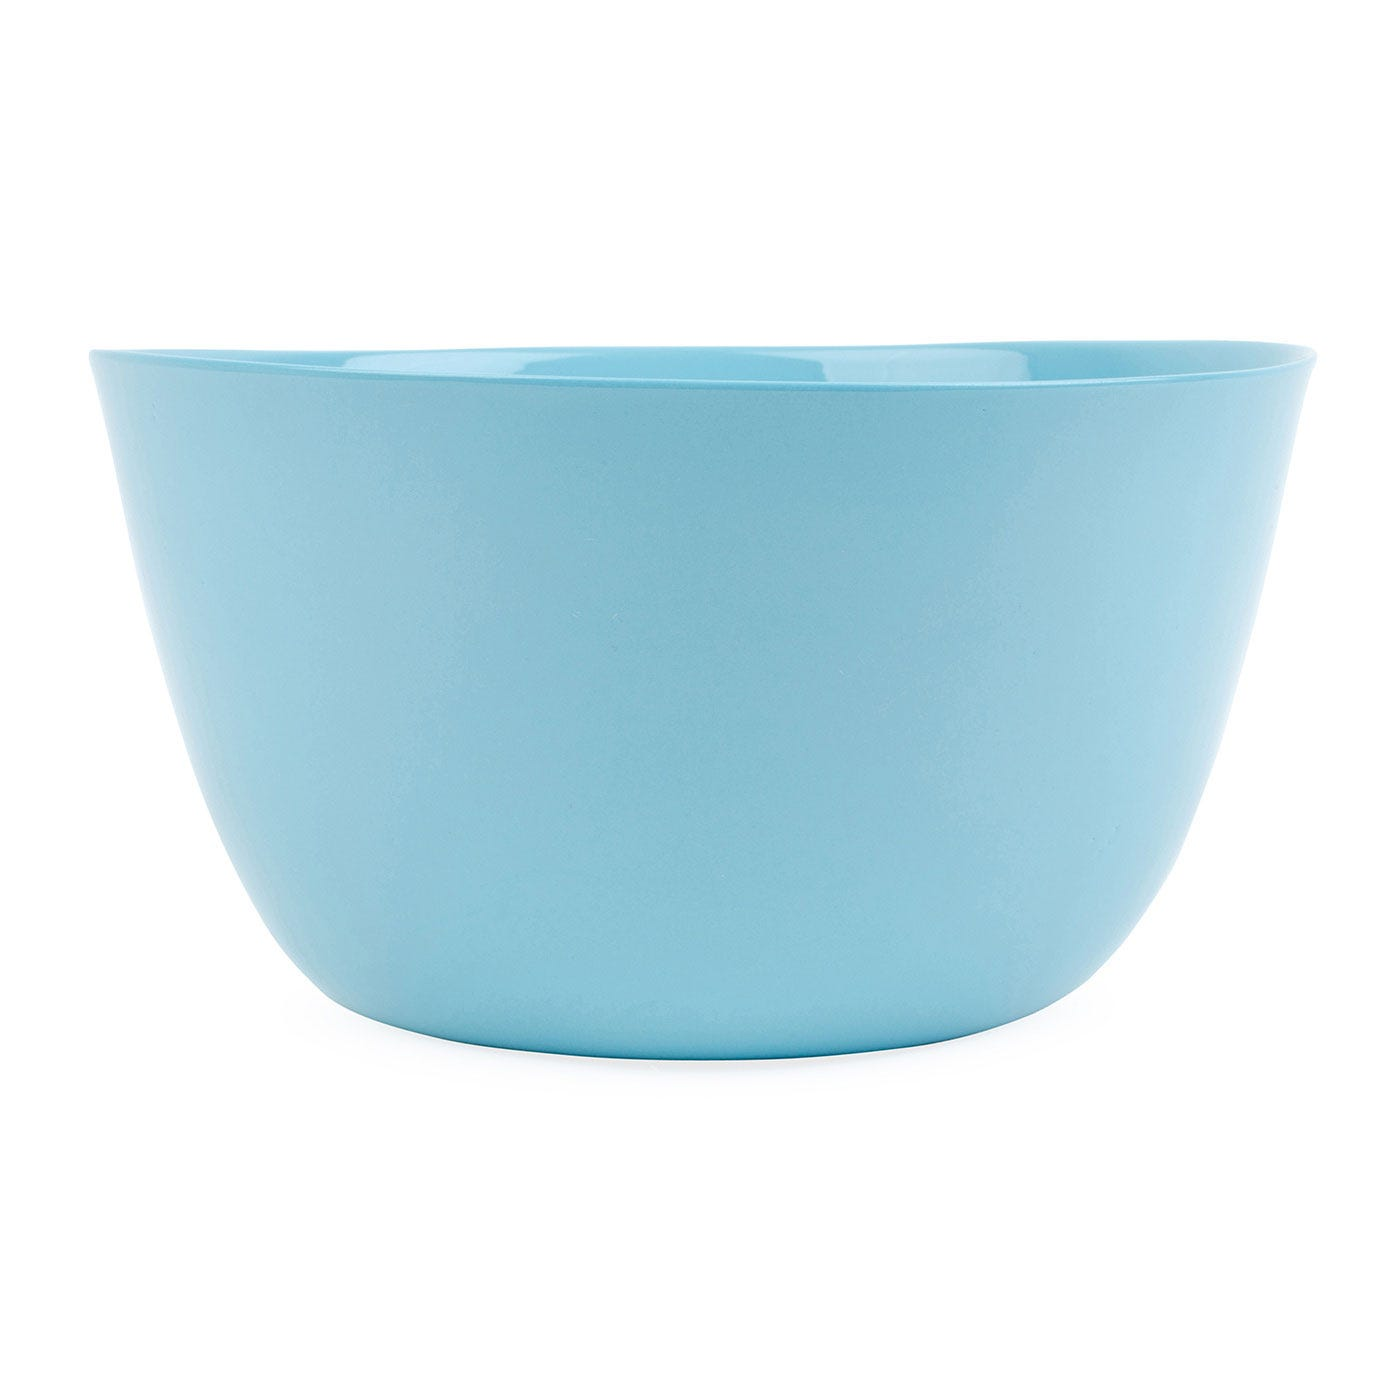 Porcelain Salad Bowl Turquoise